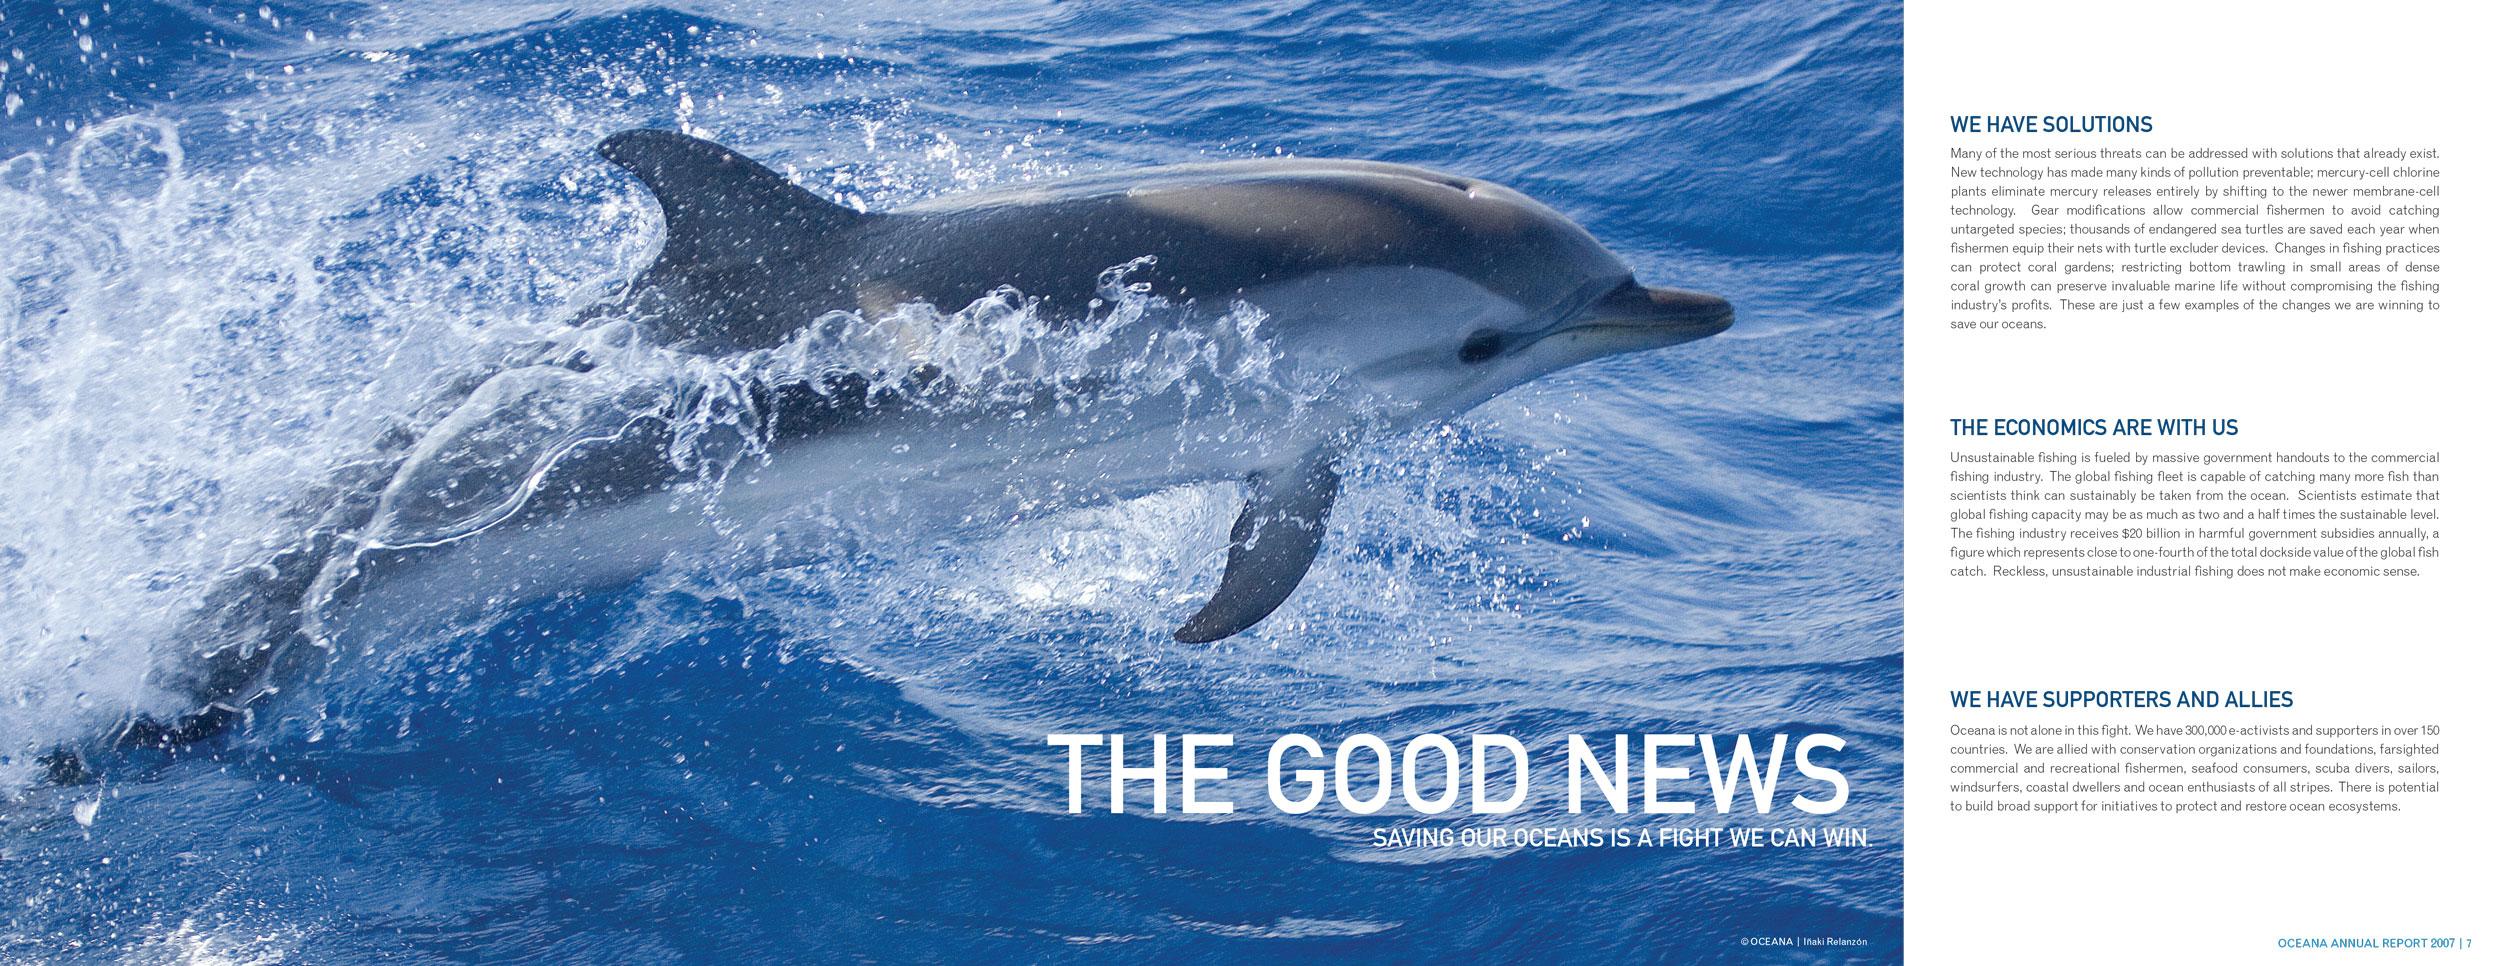 Oceana_annual_report07_FINAL-4.jpg